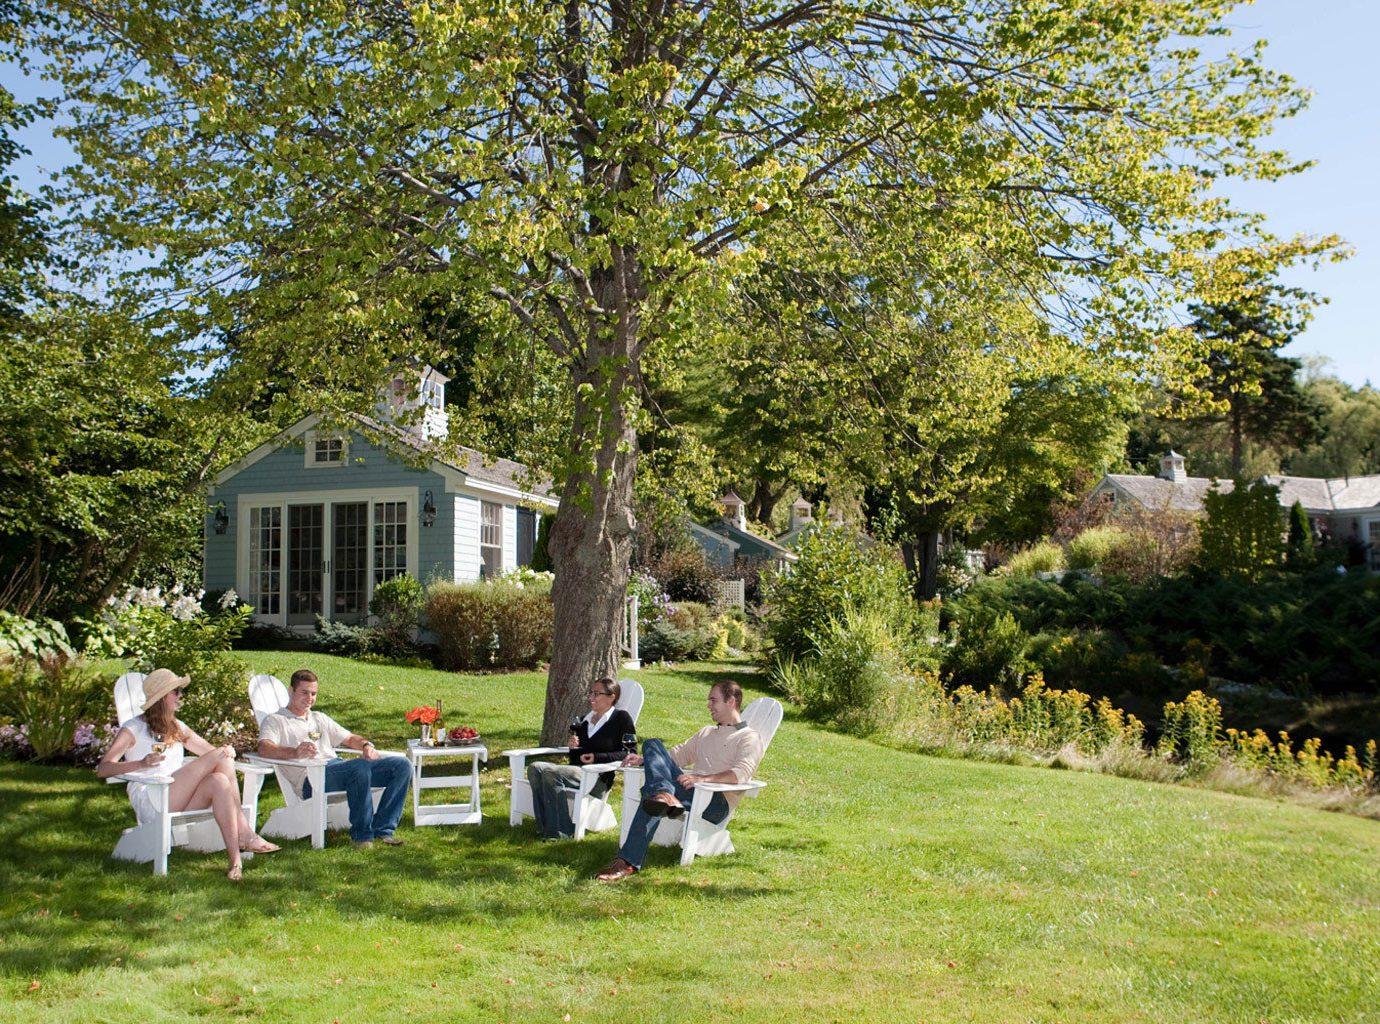 tree grass park Garden backyard home flower lawn yard woodland cottage plant